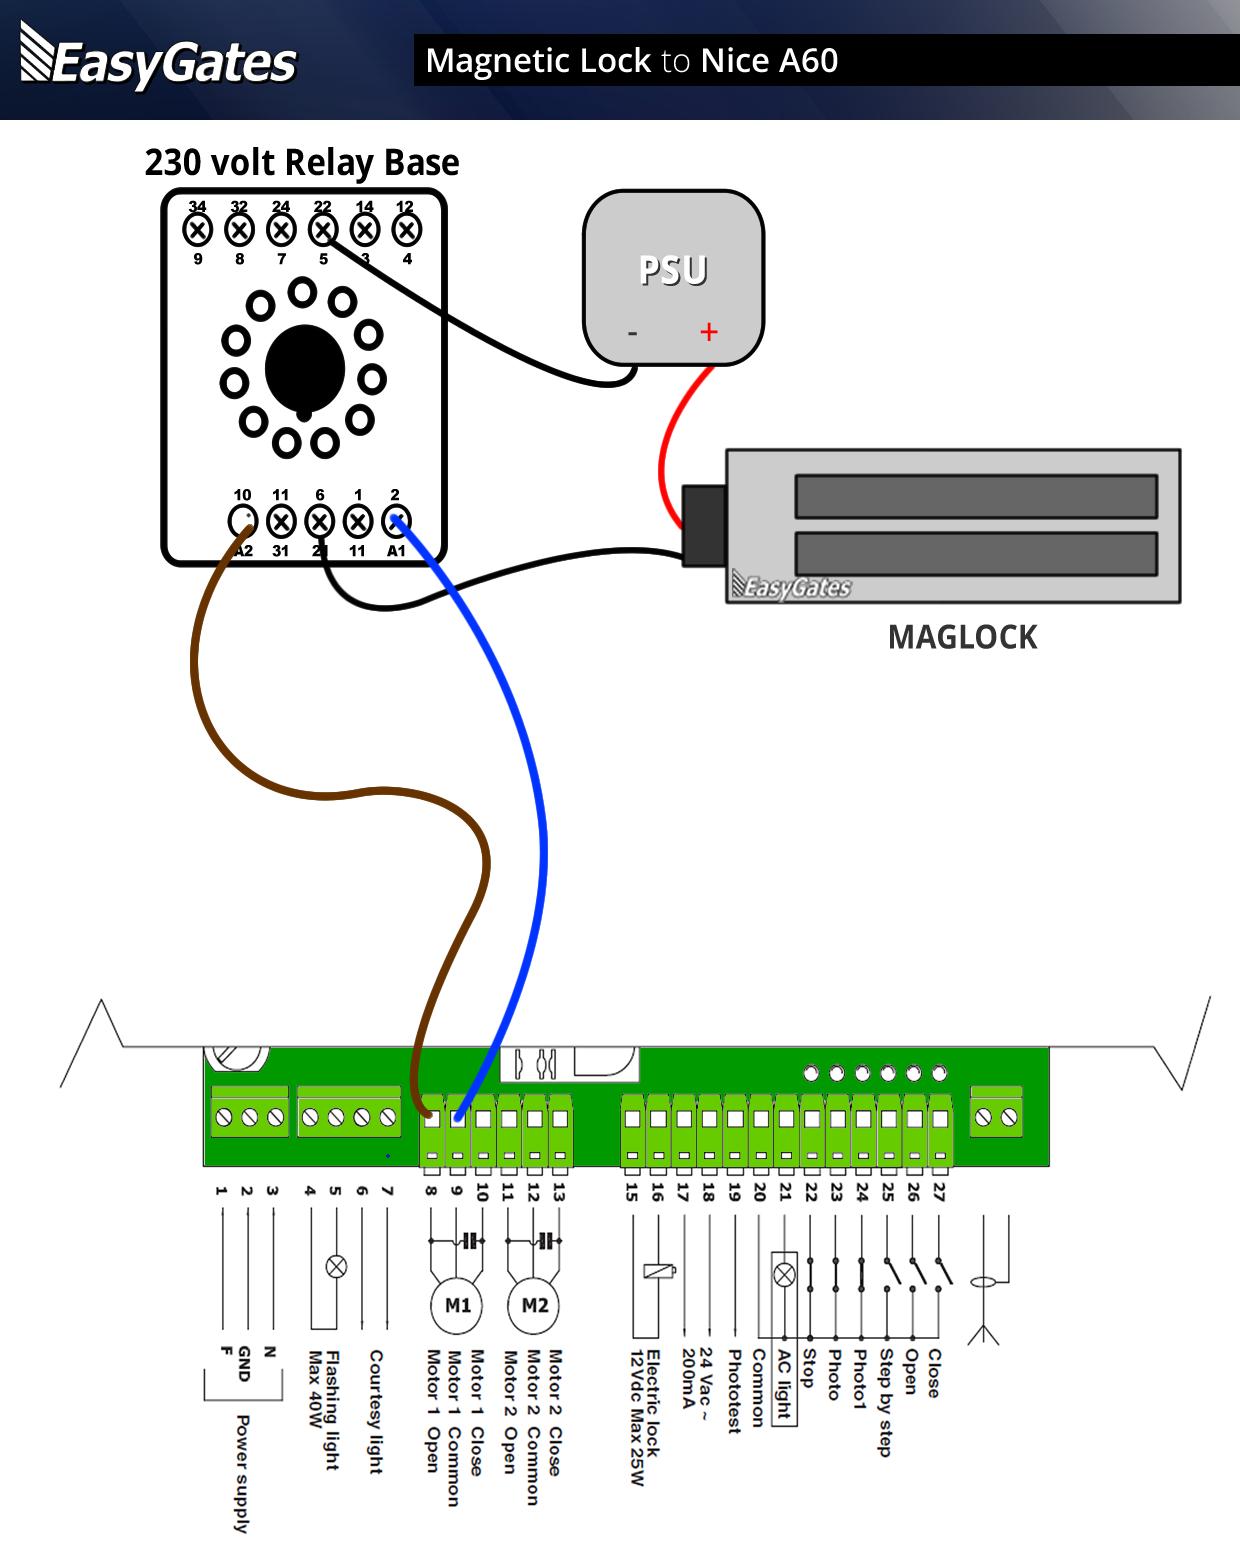 iei keypads wiring diagram iei keypad wiring diagram  iei keypad wiring diagram